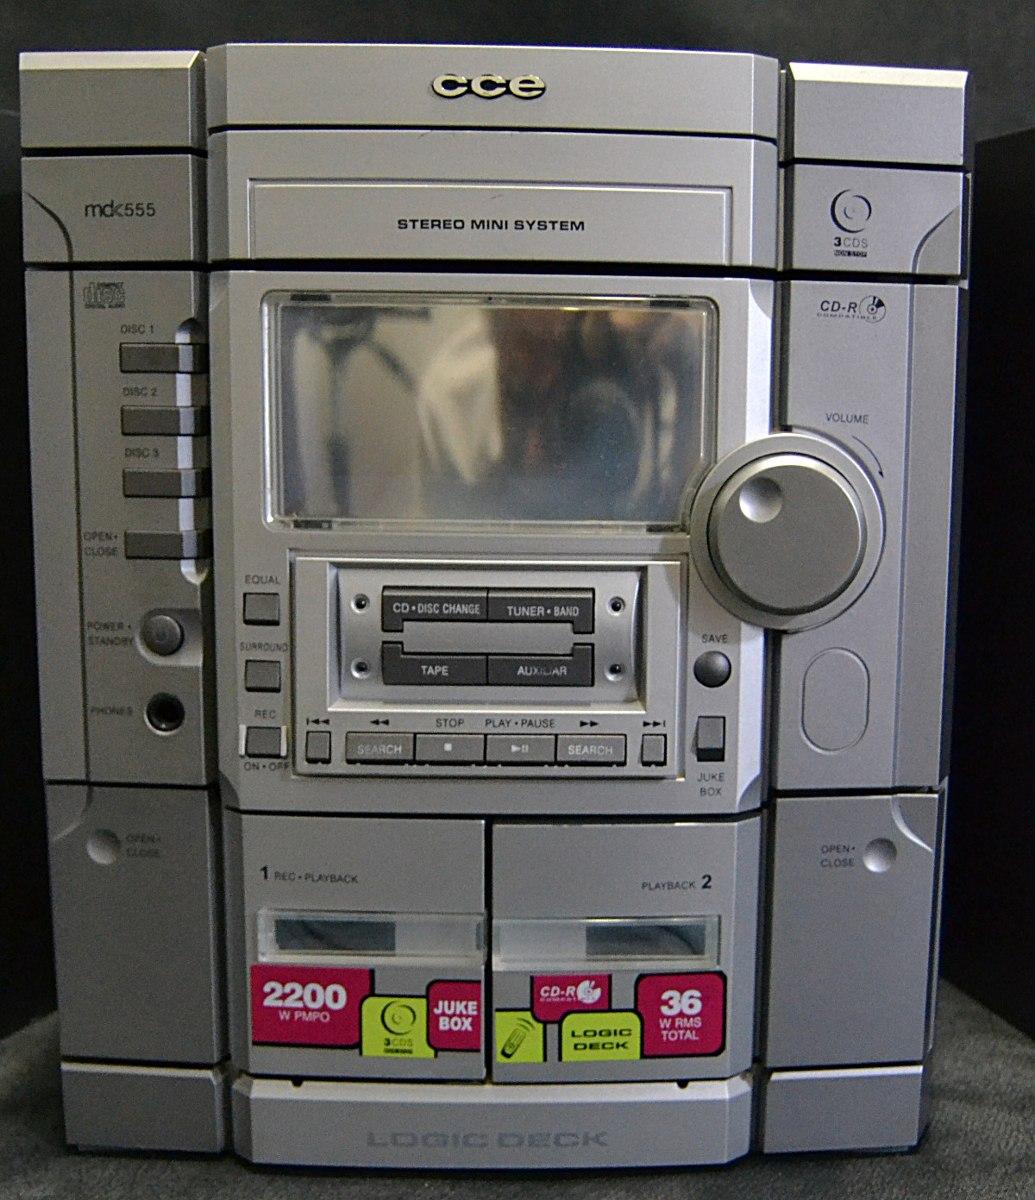 Superb Mini System Cce (3 Cdu0027s Duplo Deck) ...